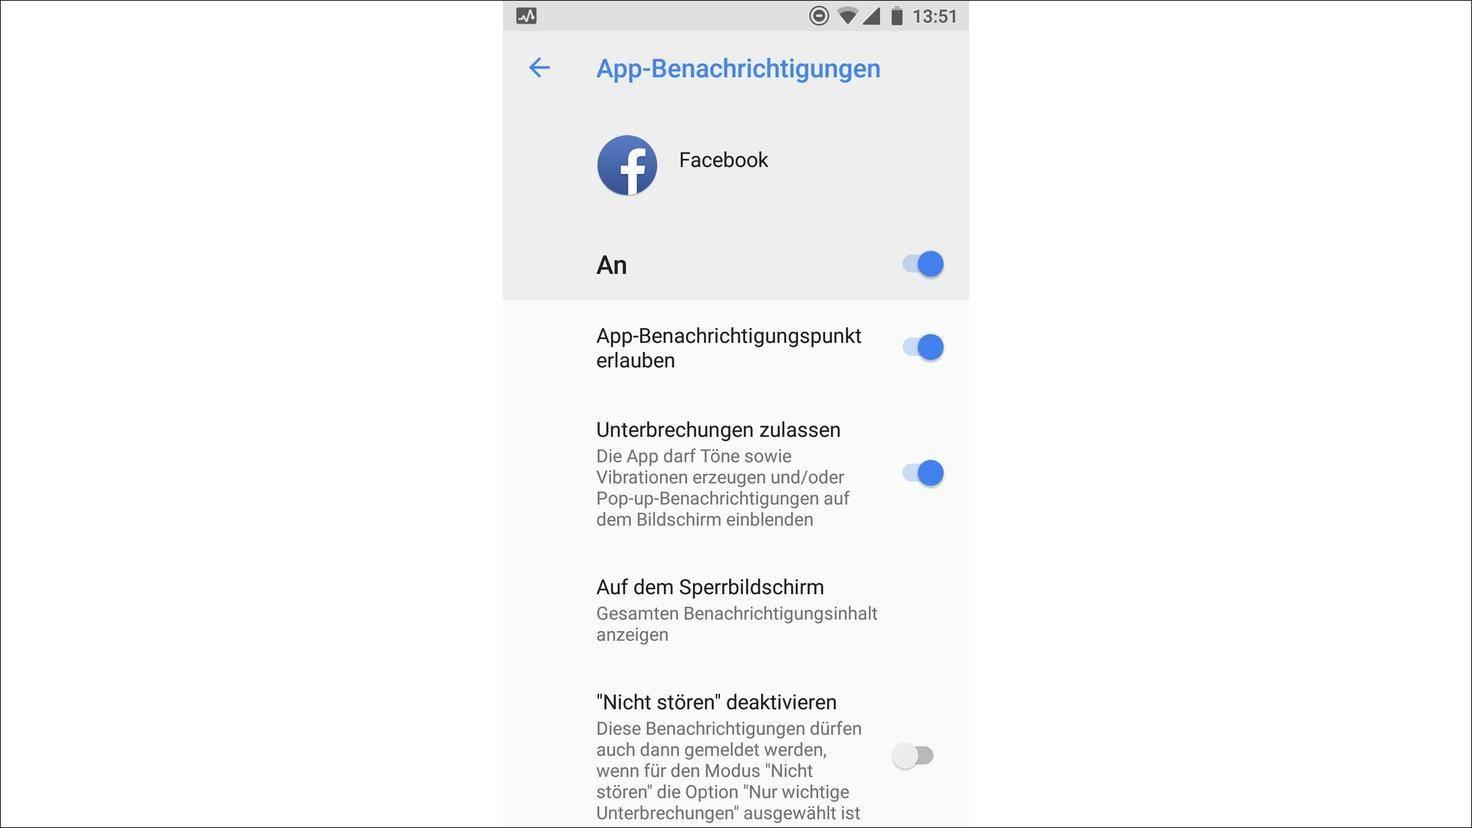 Facebook App Benachrichtigungen